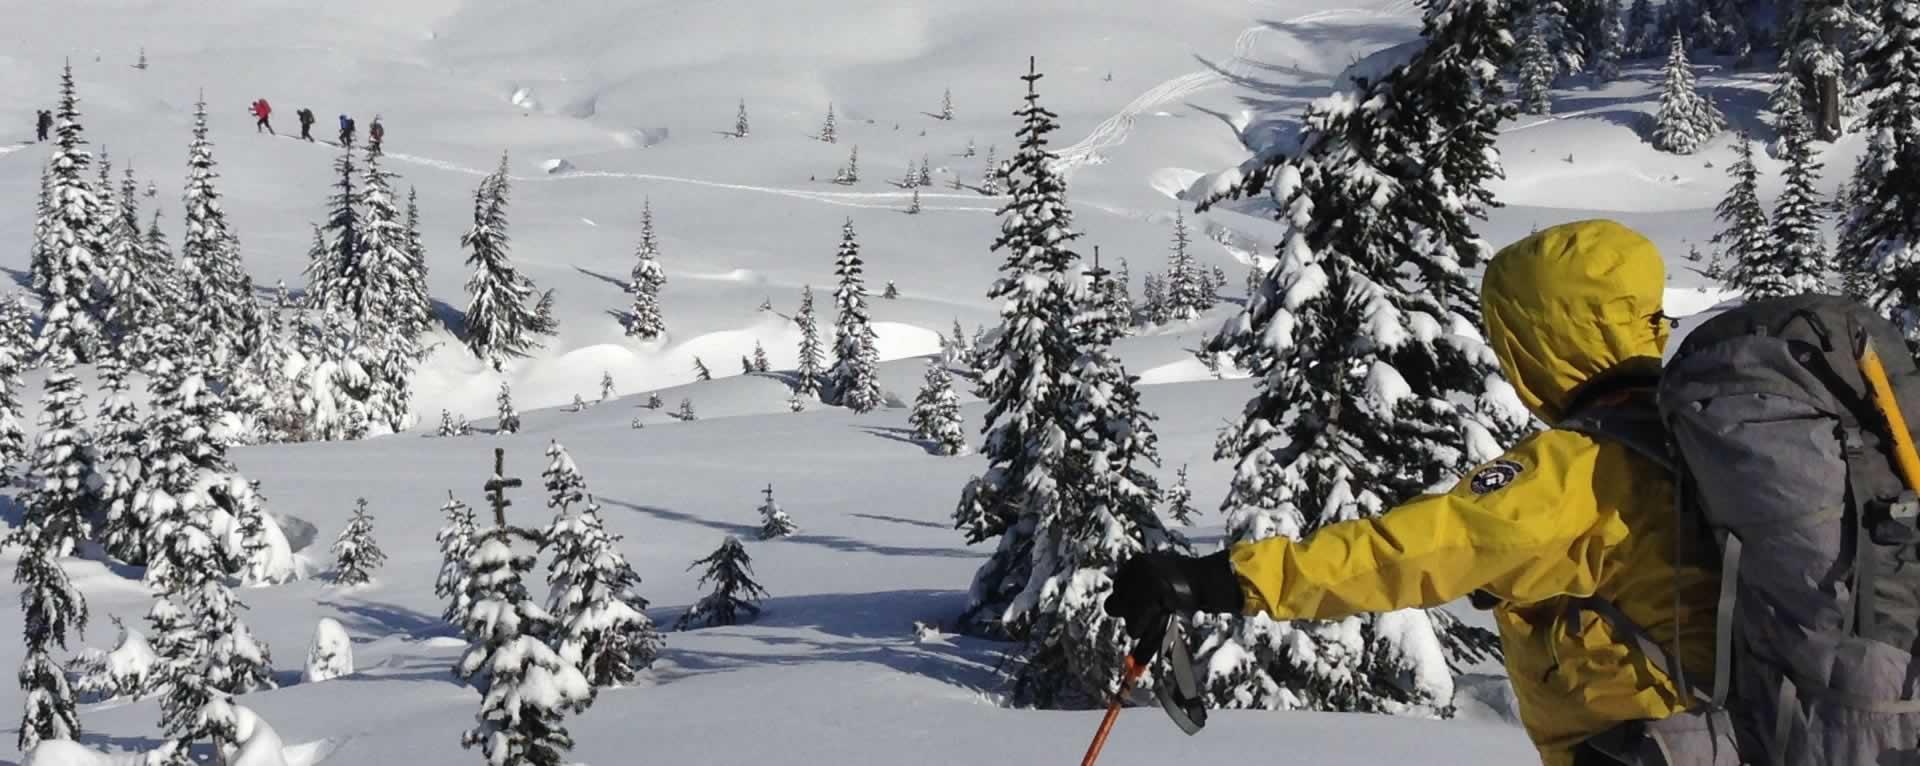 Tacoma Mountain Rescue